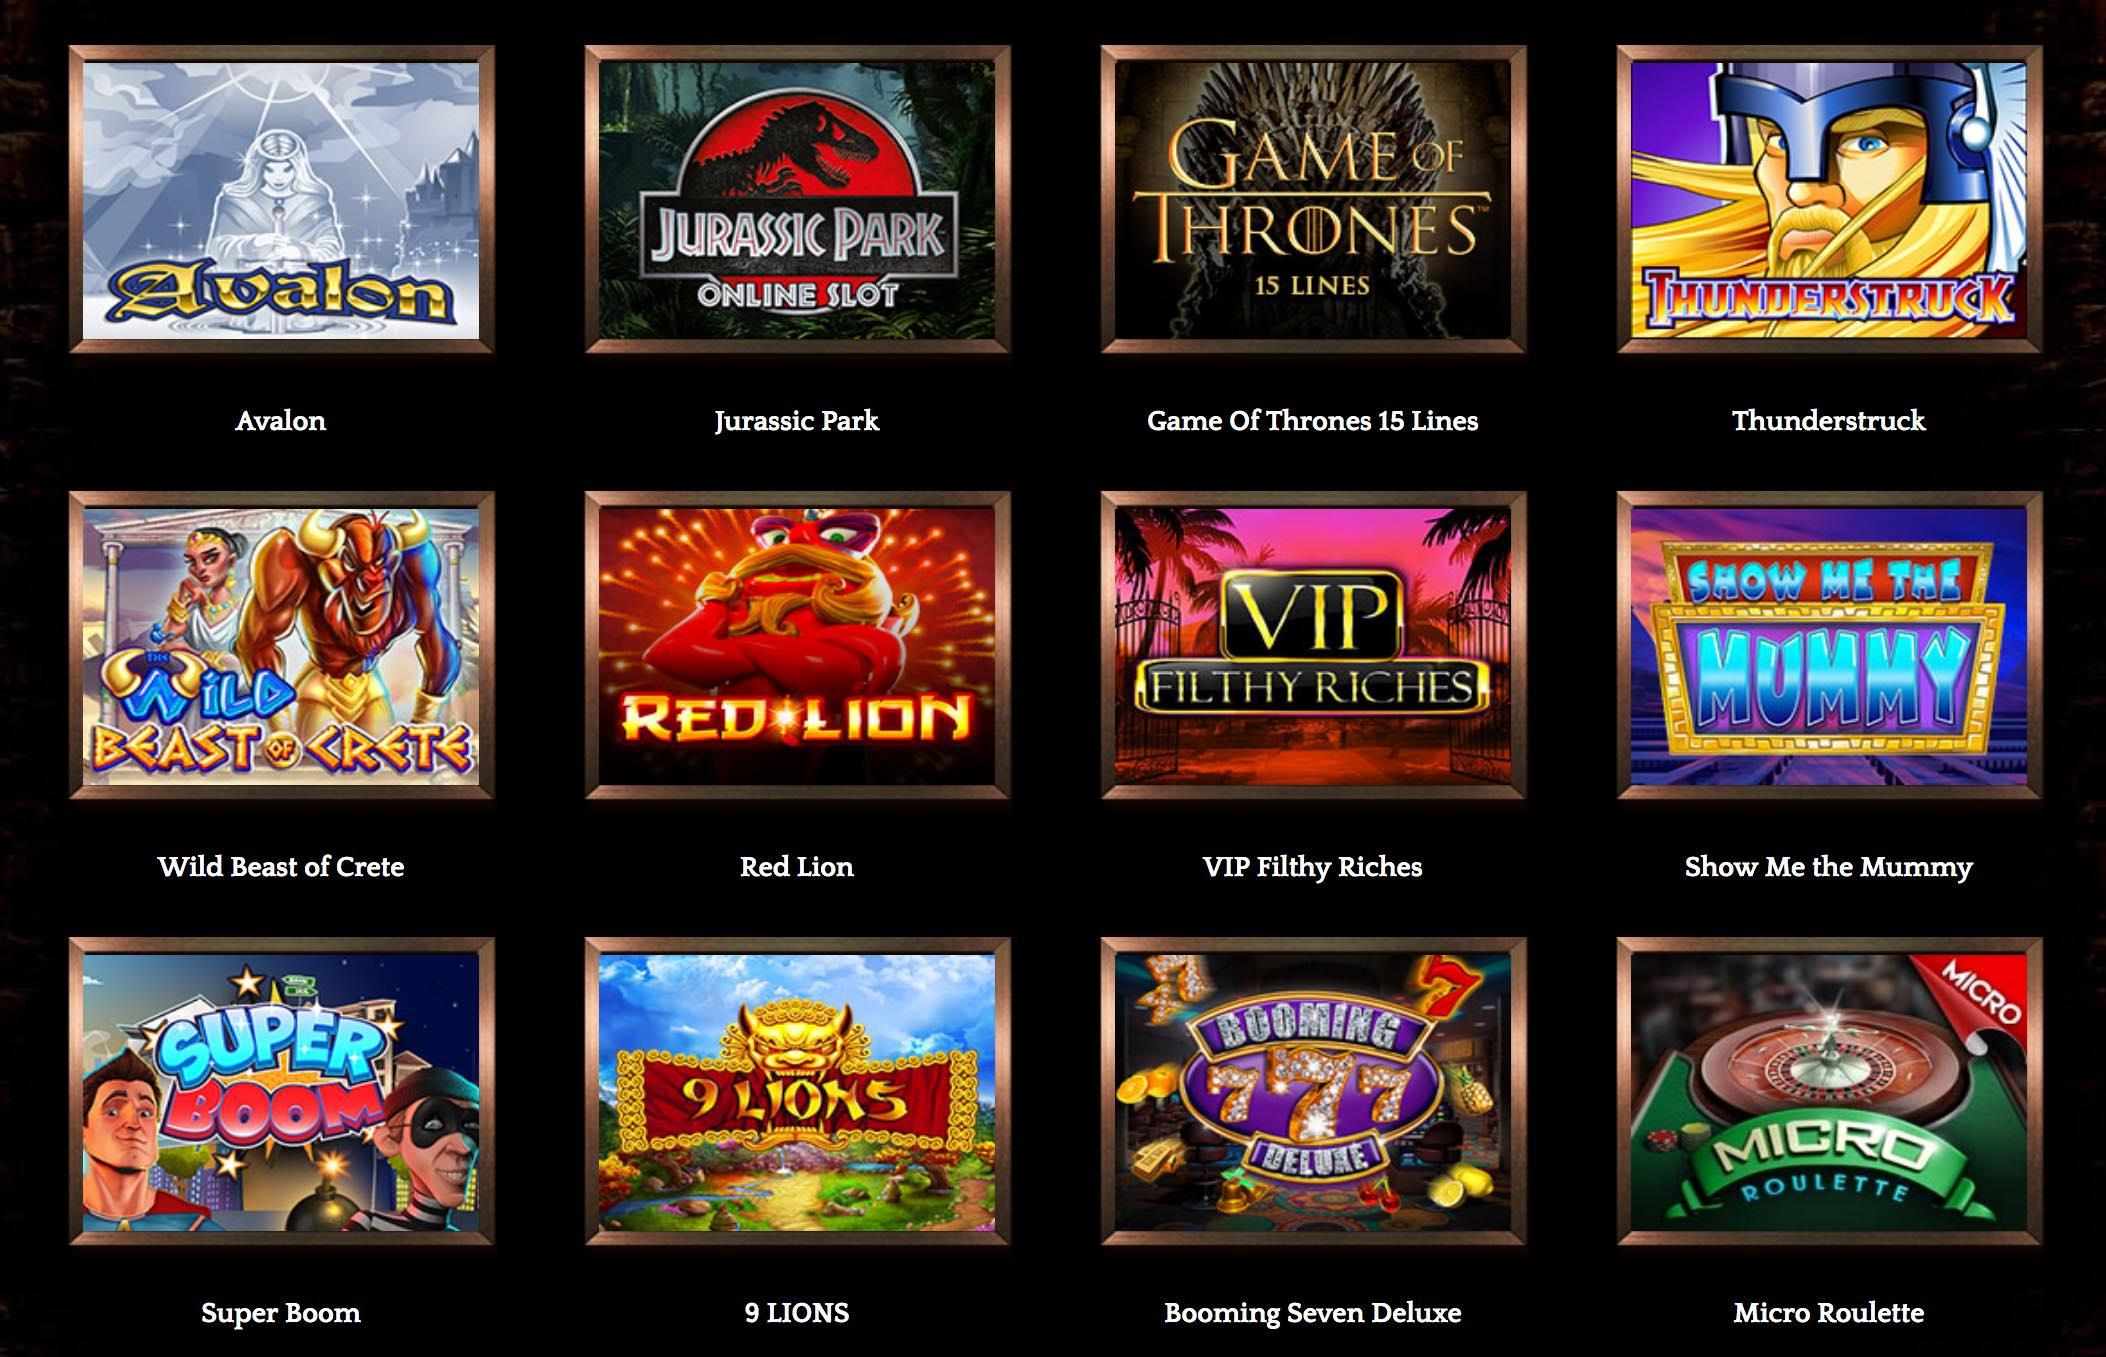 Bronze Casino Spiele